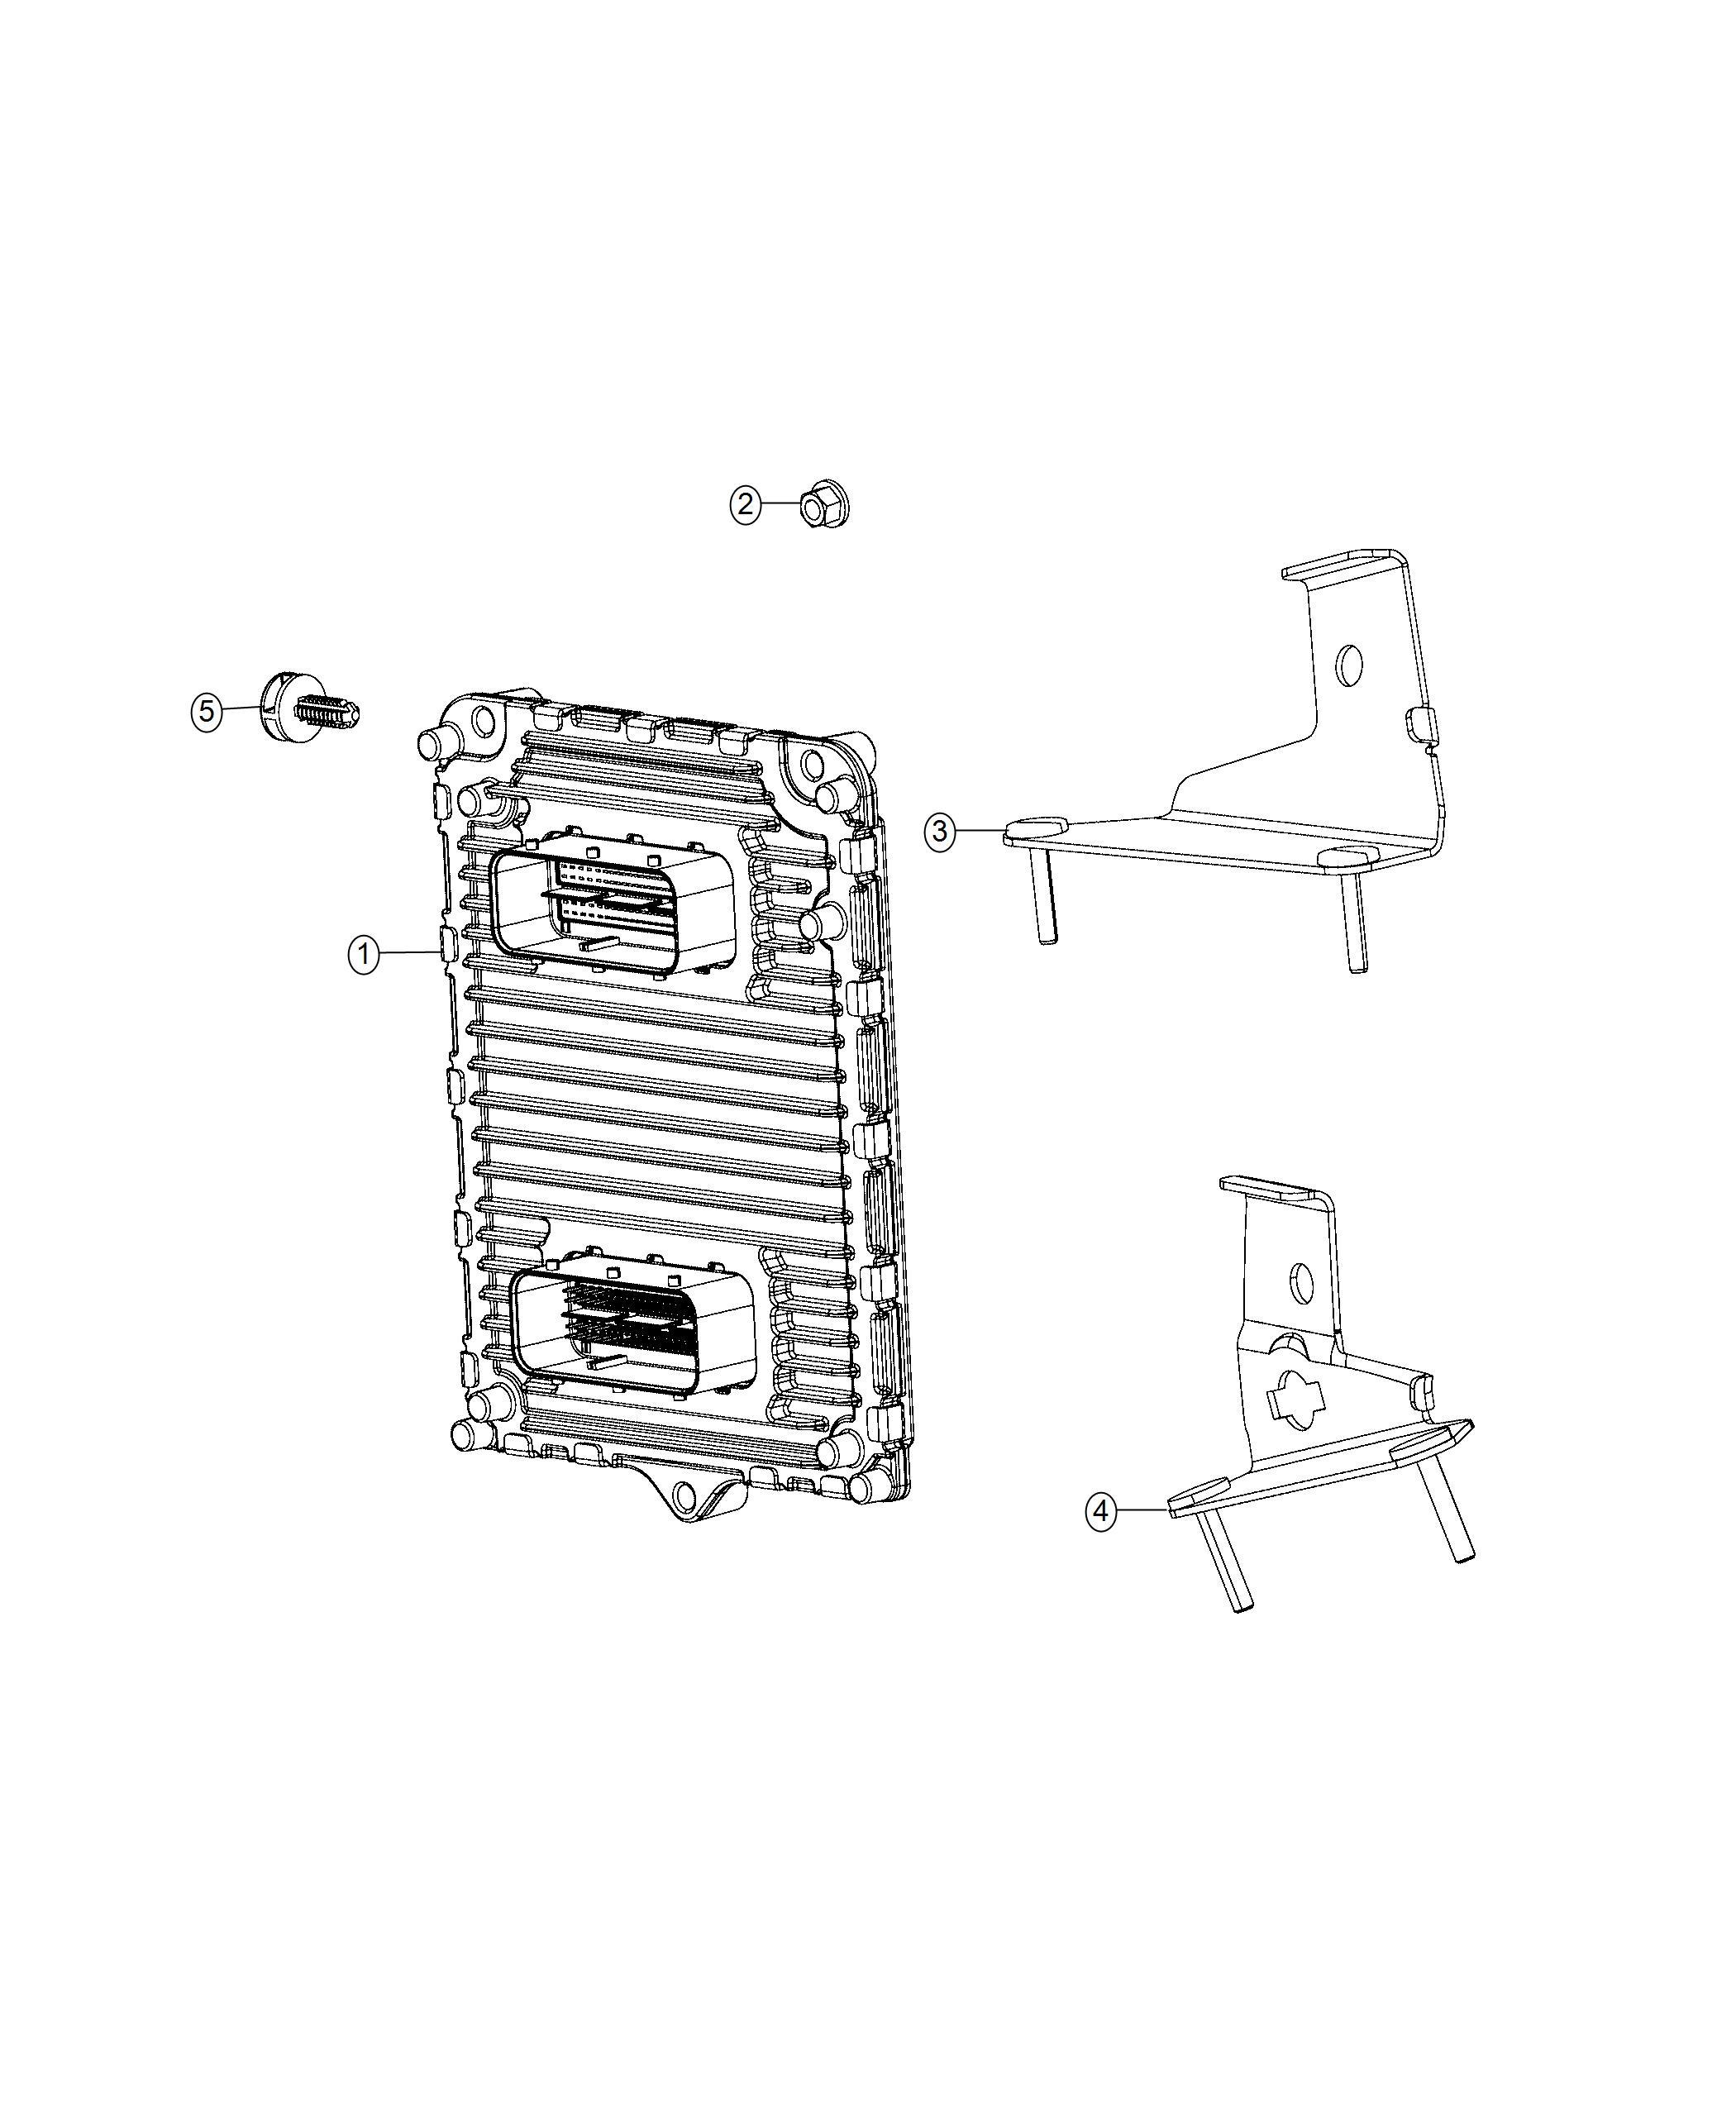 Chrysler 300 Plug. Noise. [3.6l v6 24v vvt engine], [5.7l